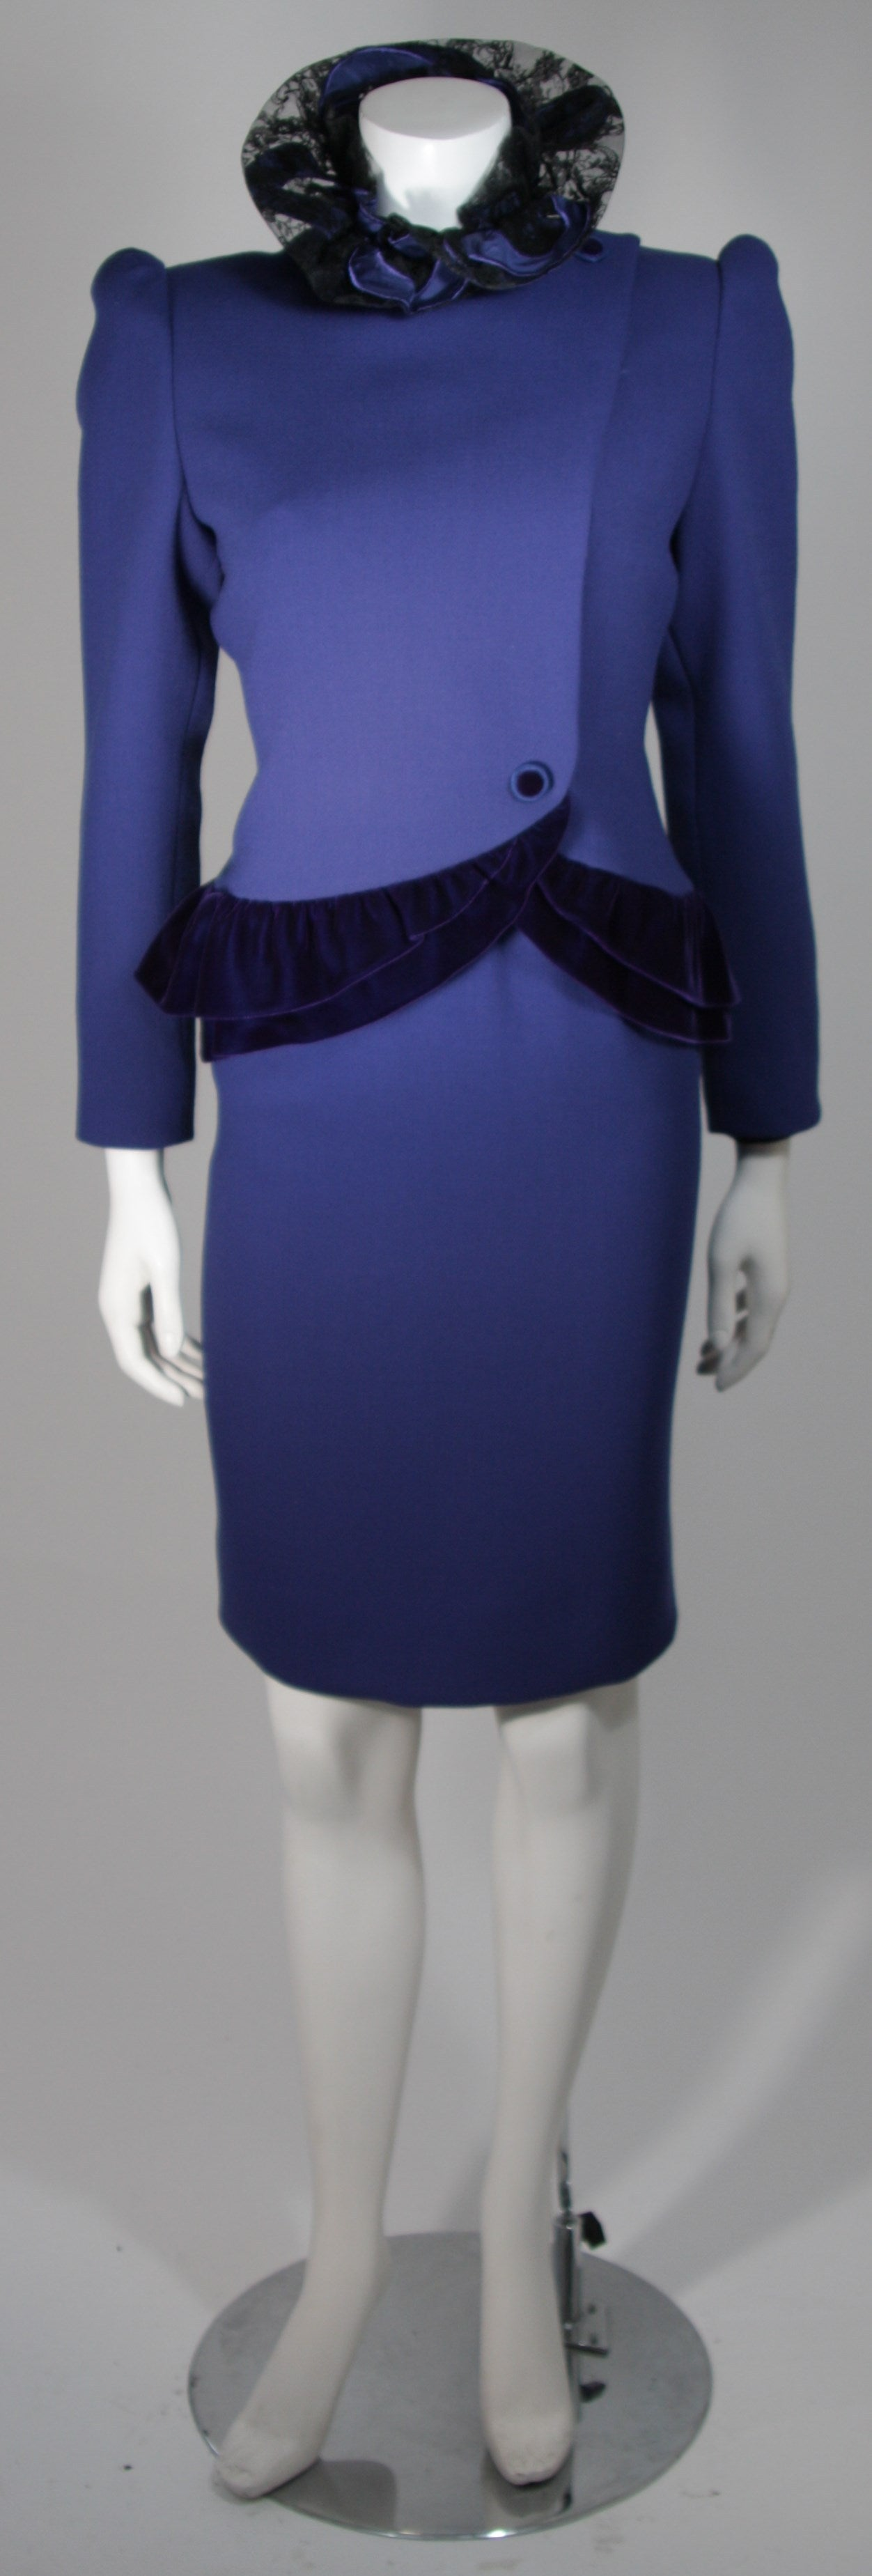 carolina herrera couture royal blue skirt suit ensemble